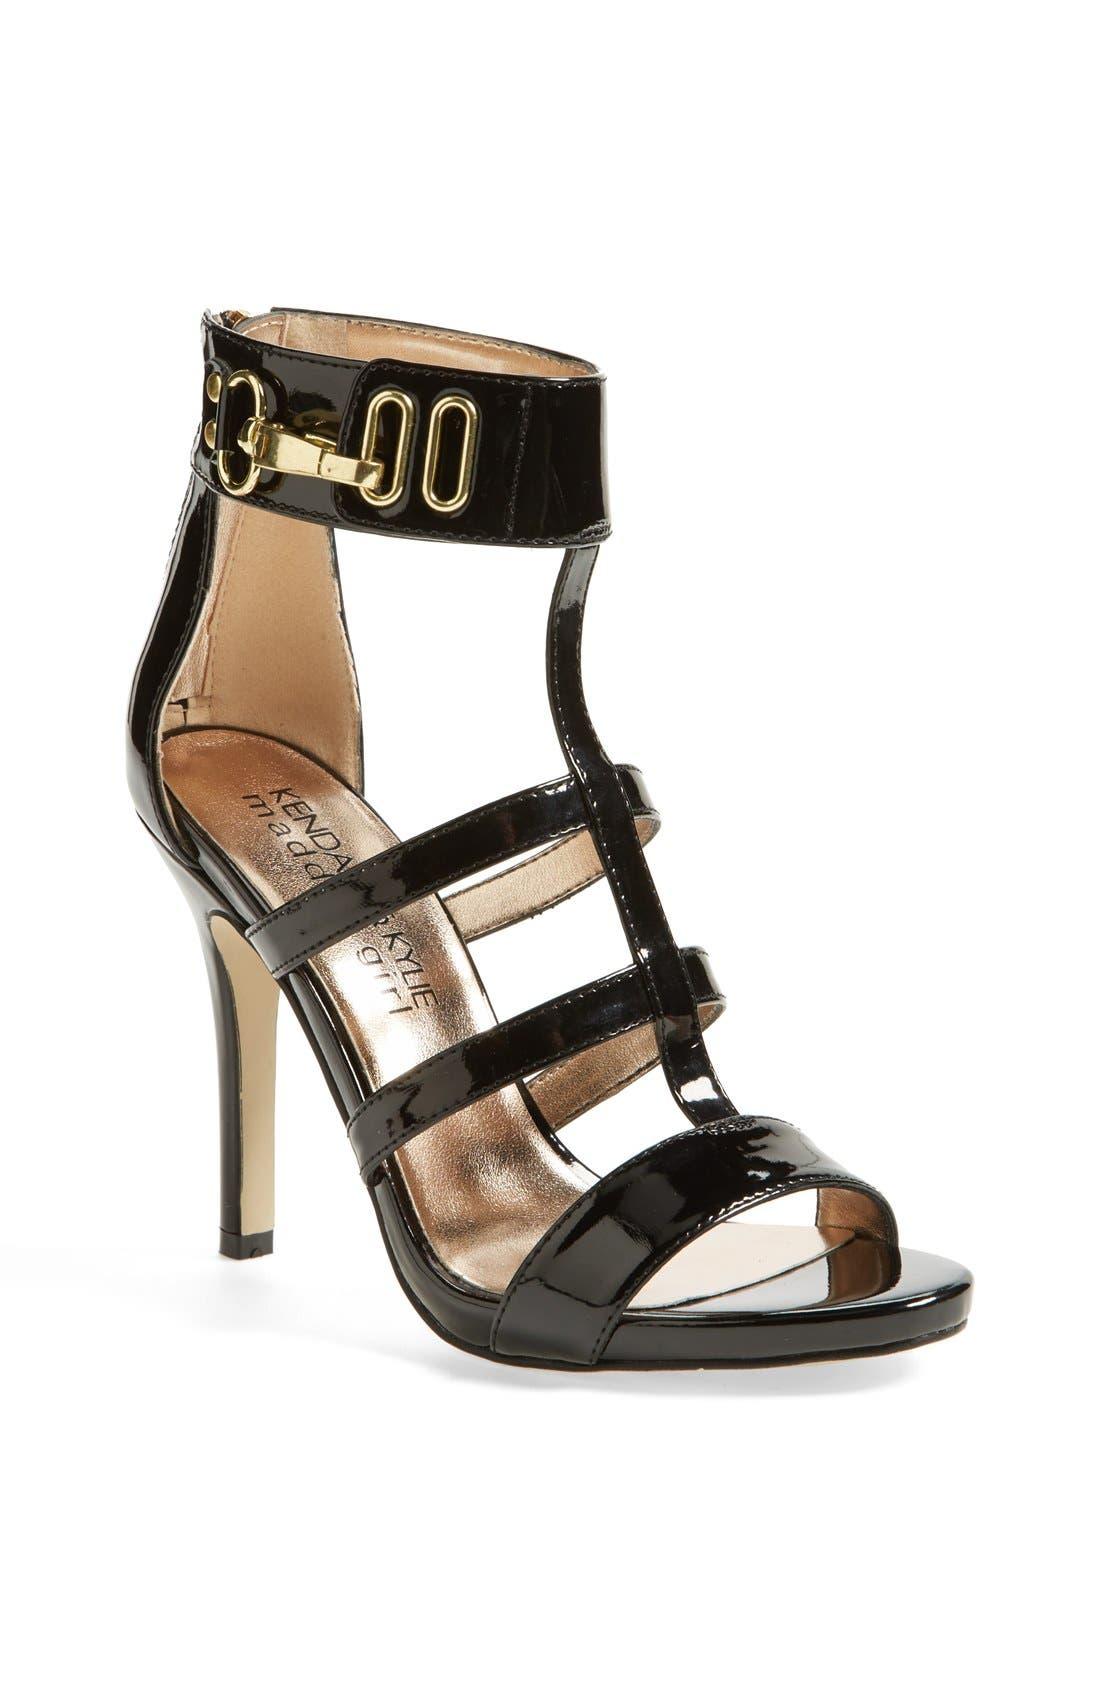 Alternate Image 1 Selected - KENDALL + KYLIE Madden Girl 'Rocklinn' Sandals